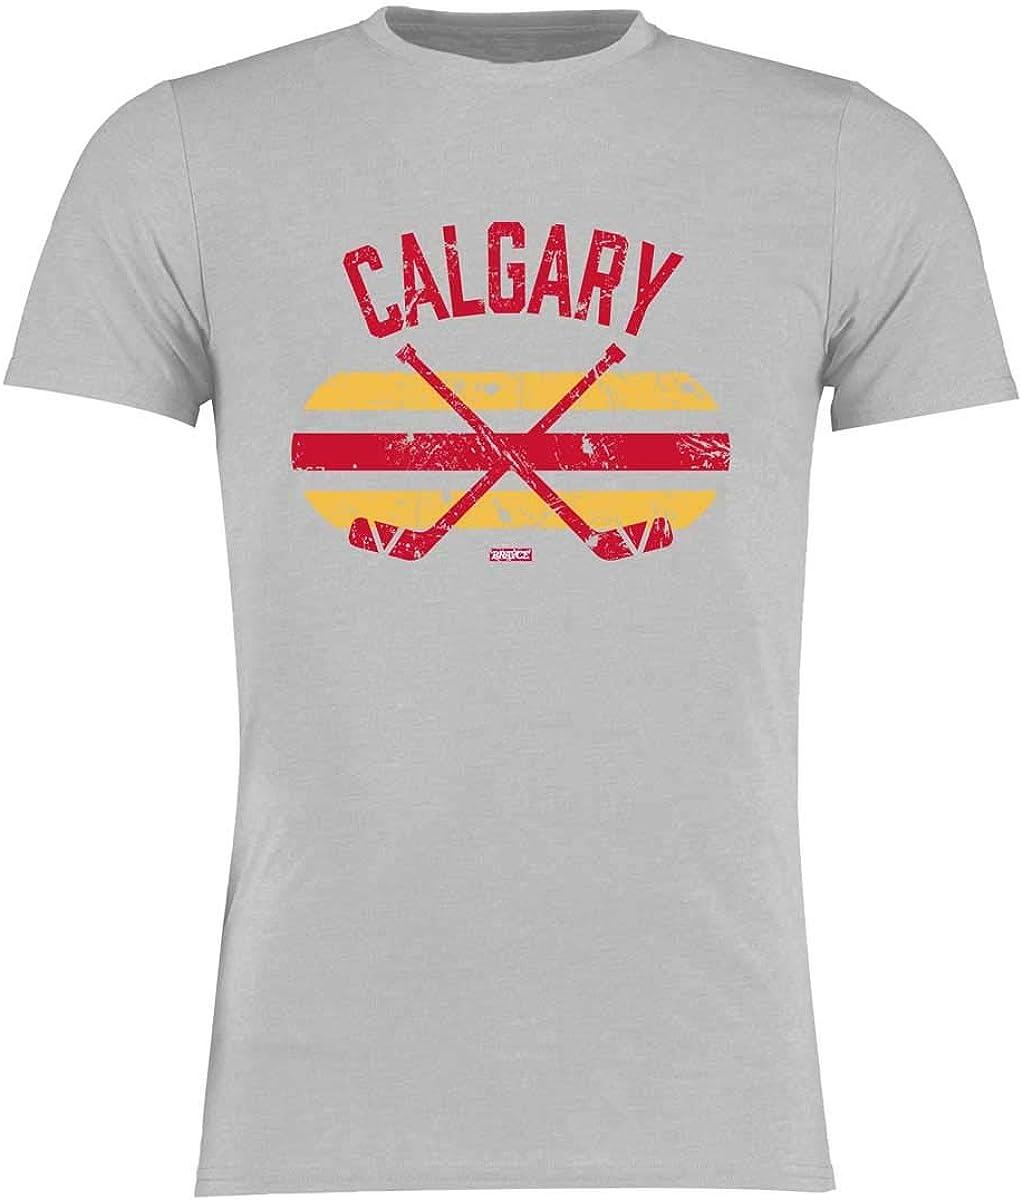 3XL I Hockey Style f/ür Eishockeyspieler und Fans BRAYCE/® Calgary T-Shirt I Eishockey Shirt Gr/ö/ße S